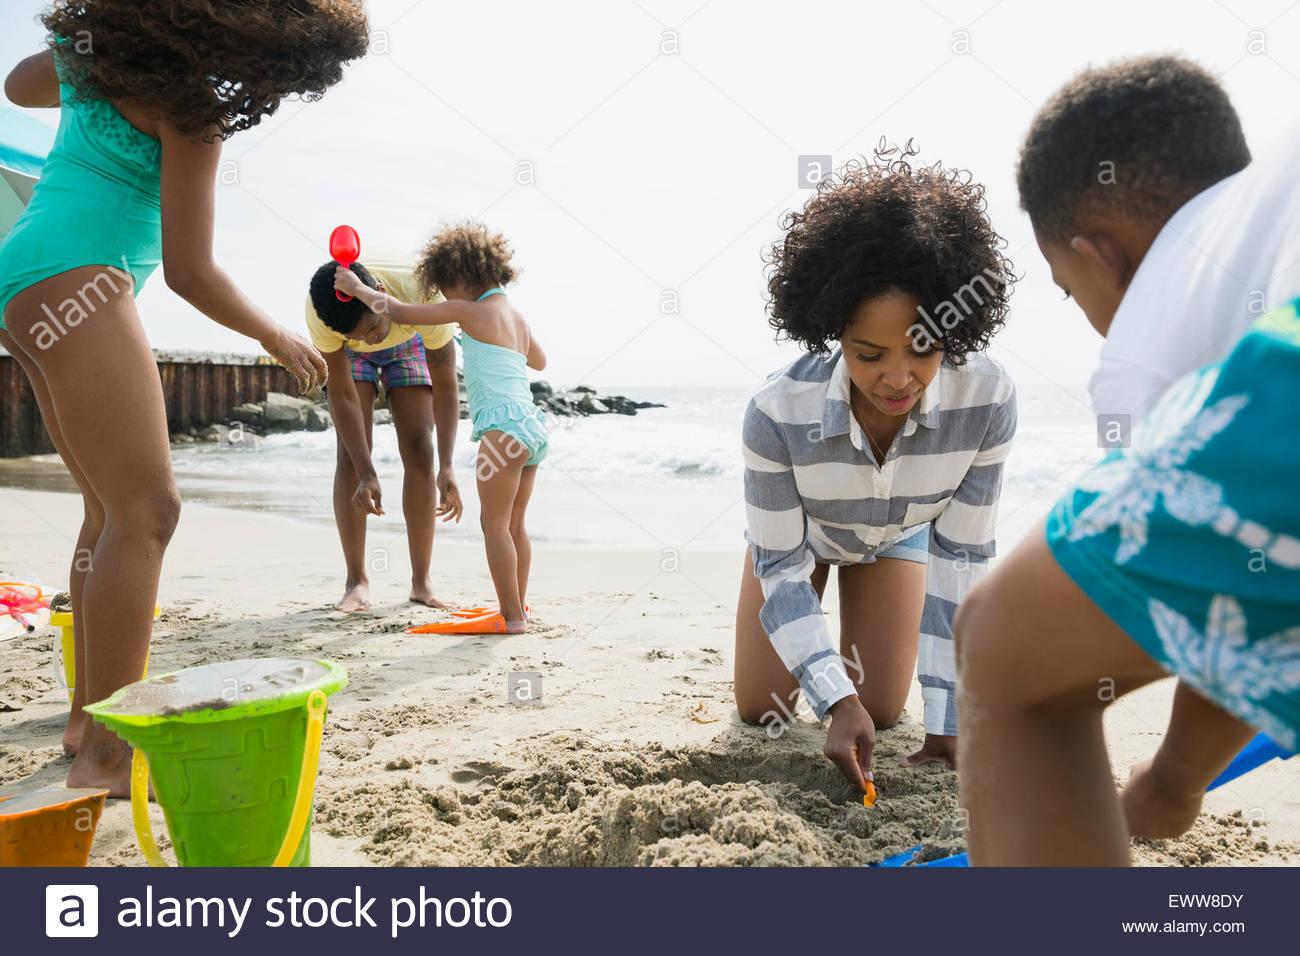 Family making sandcastle on beach - Stock Image